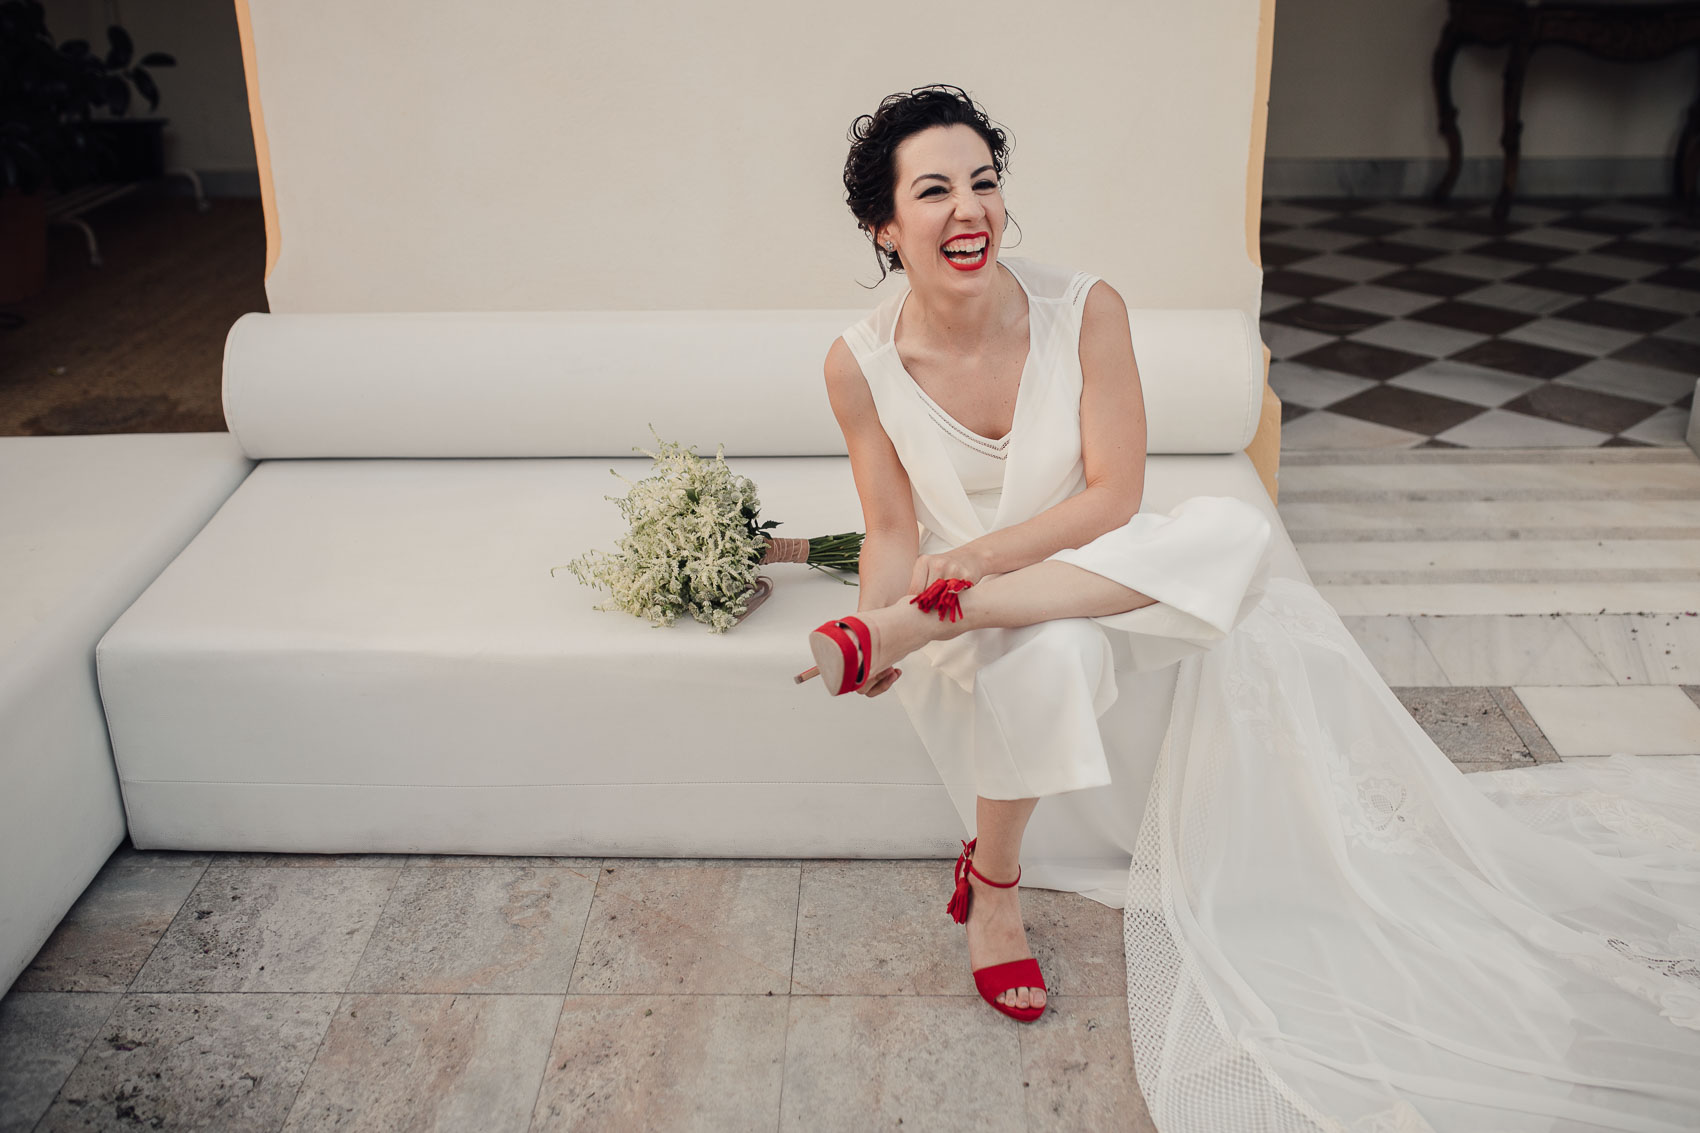 Novia con pantalón y zapatos rojos Cayetana Ferrer